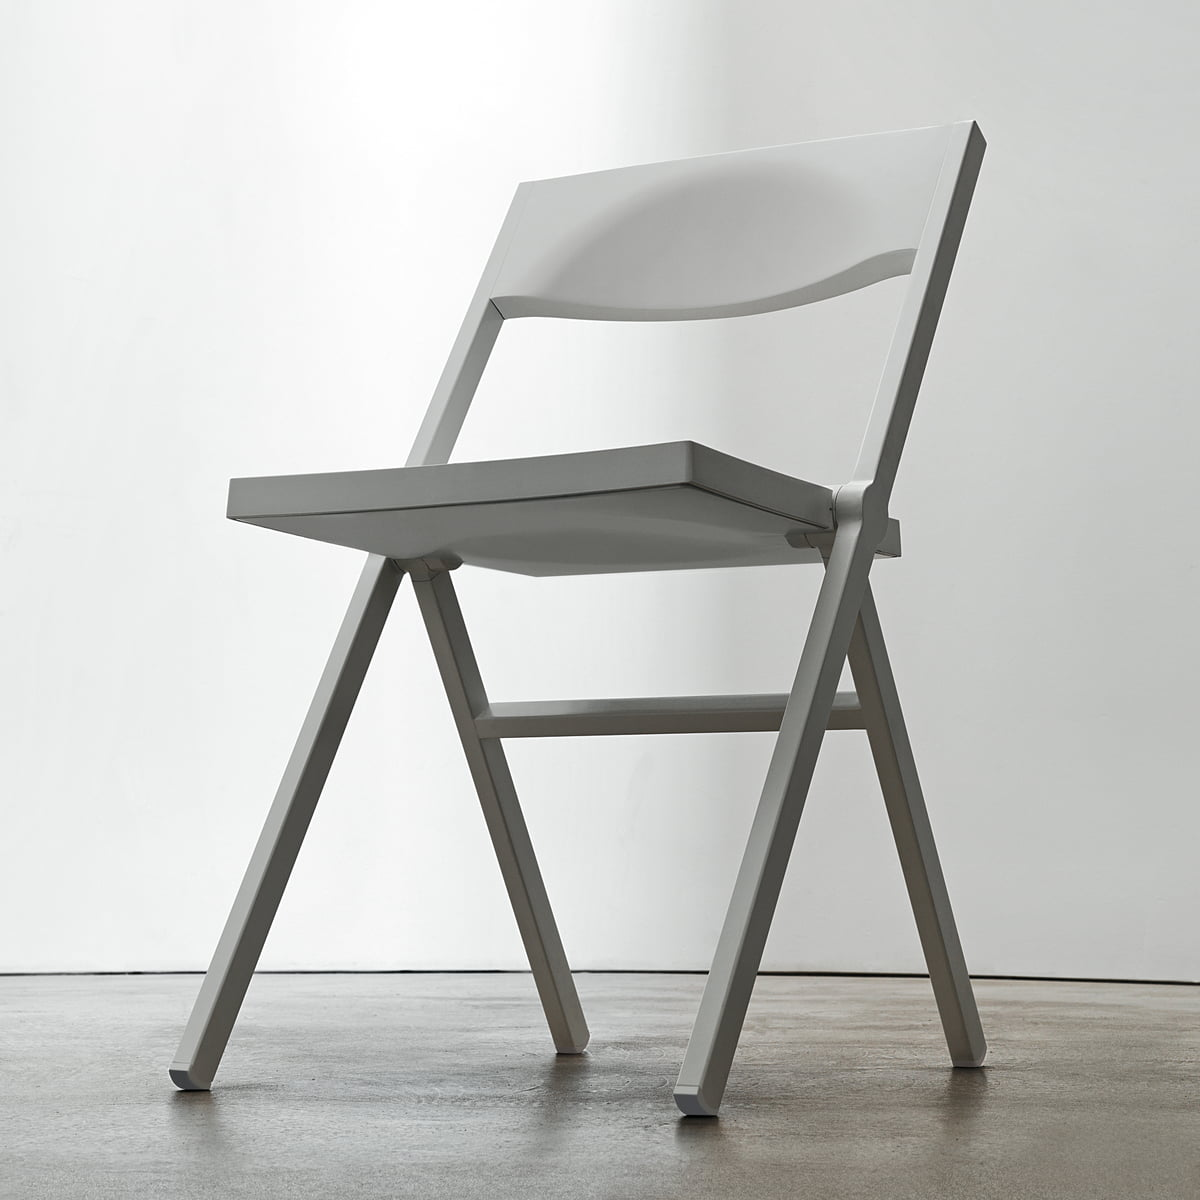 Alessichair By Lamm   Piana Folding Chair